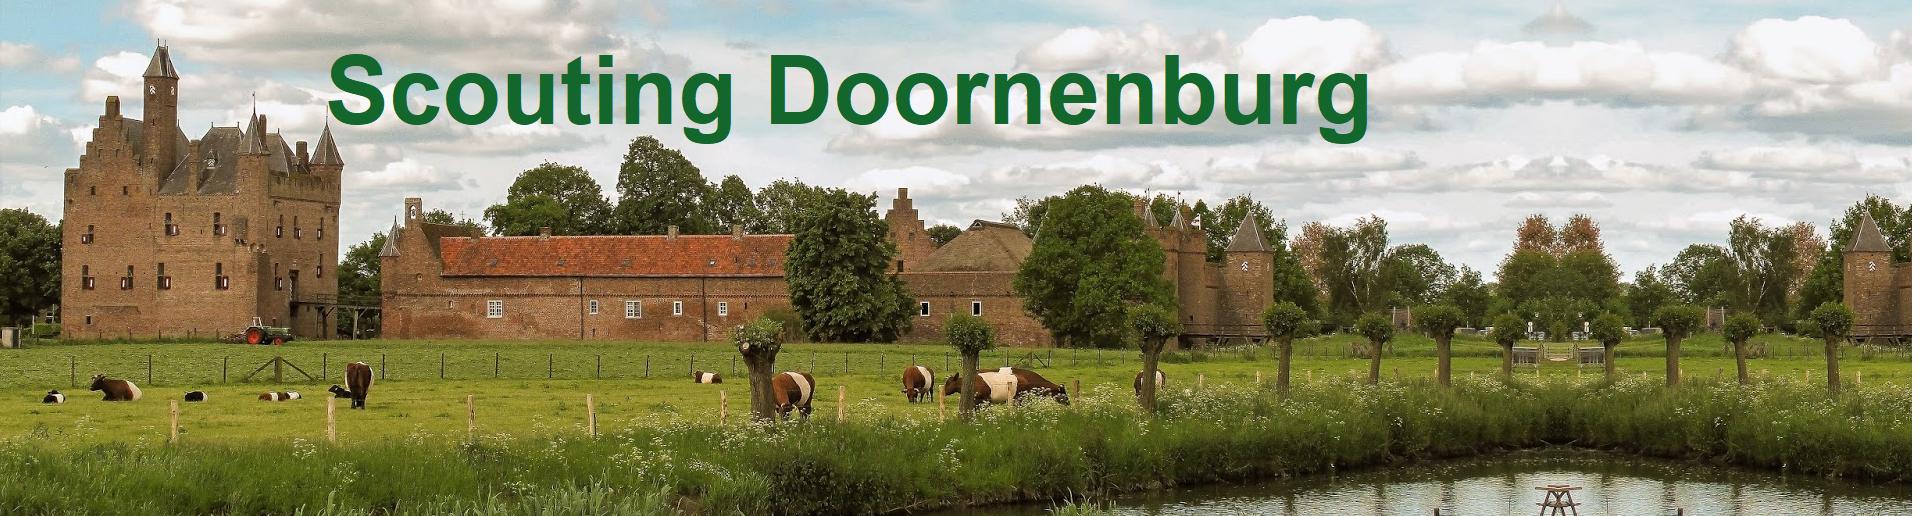 Scouting Doornenburg